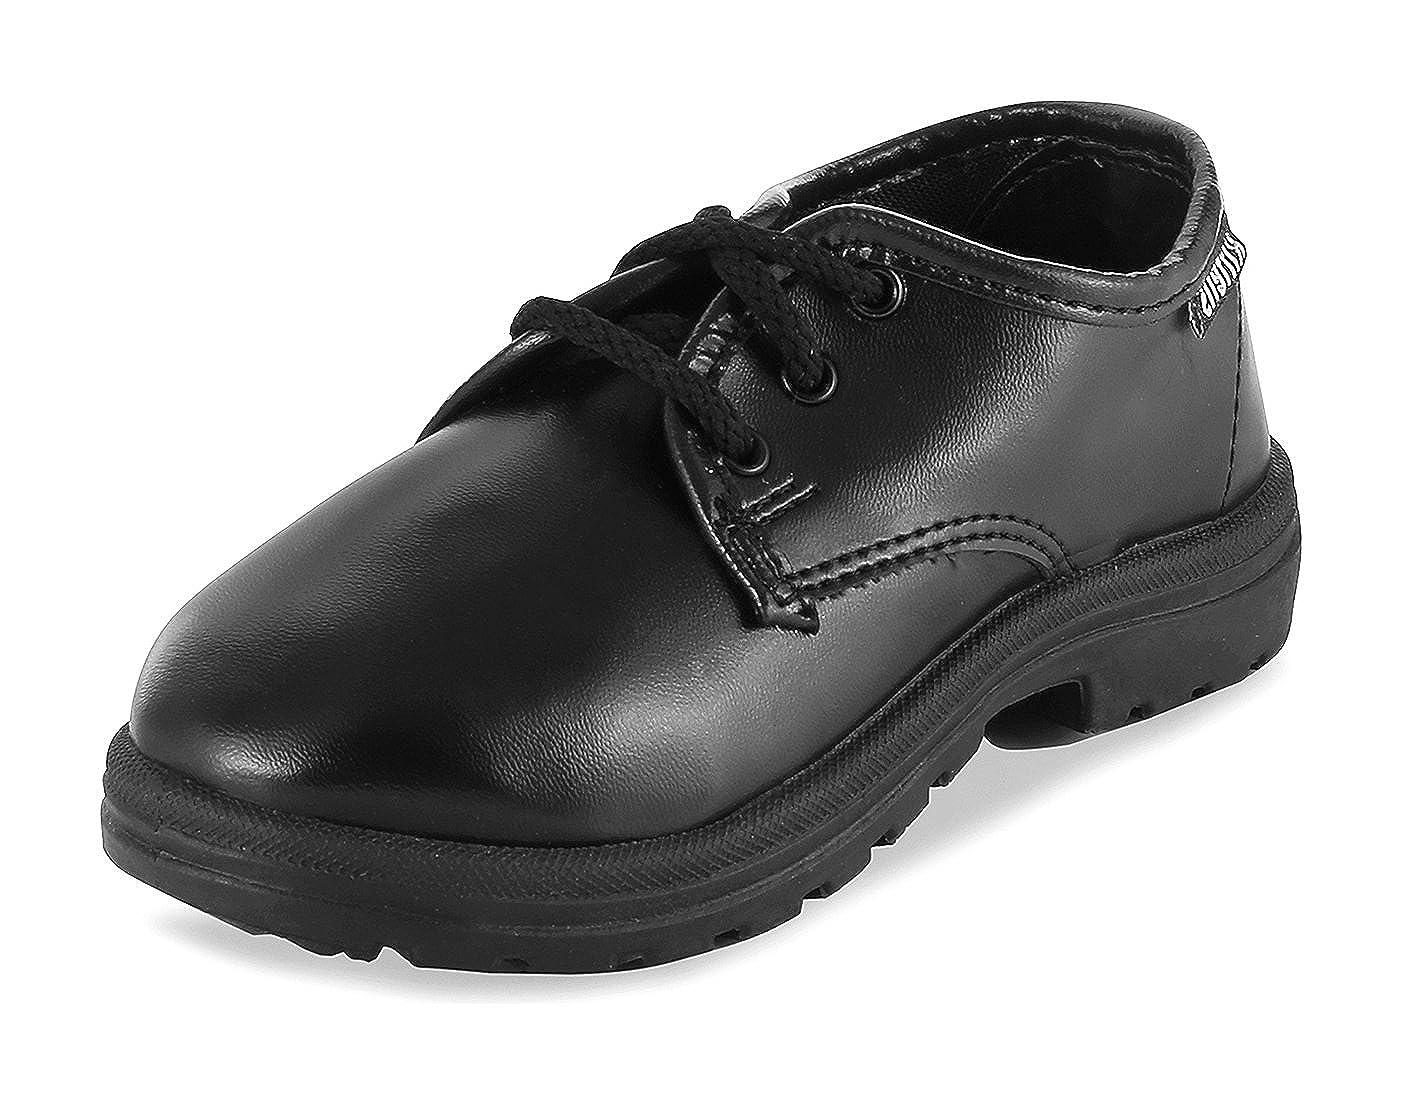 Buy KITTENS Boys' Black School Shoes